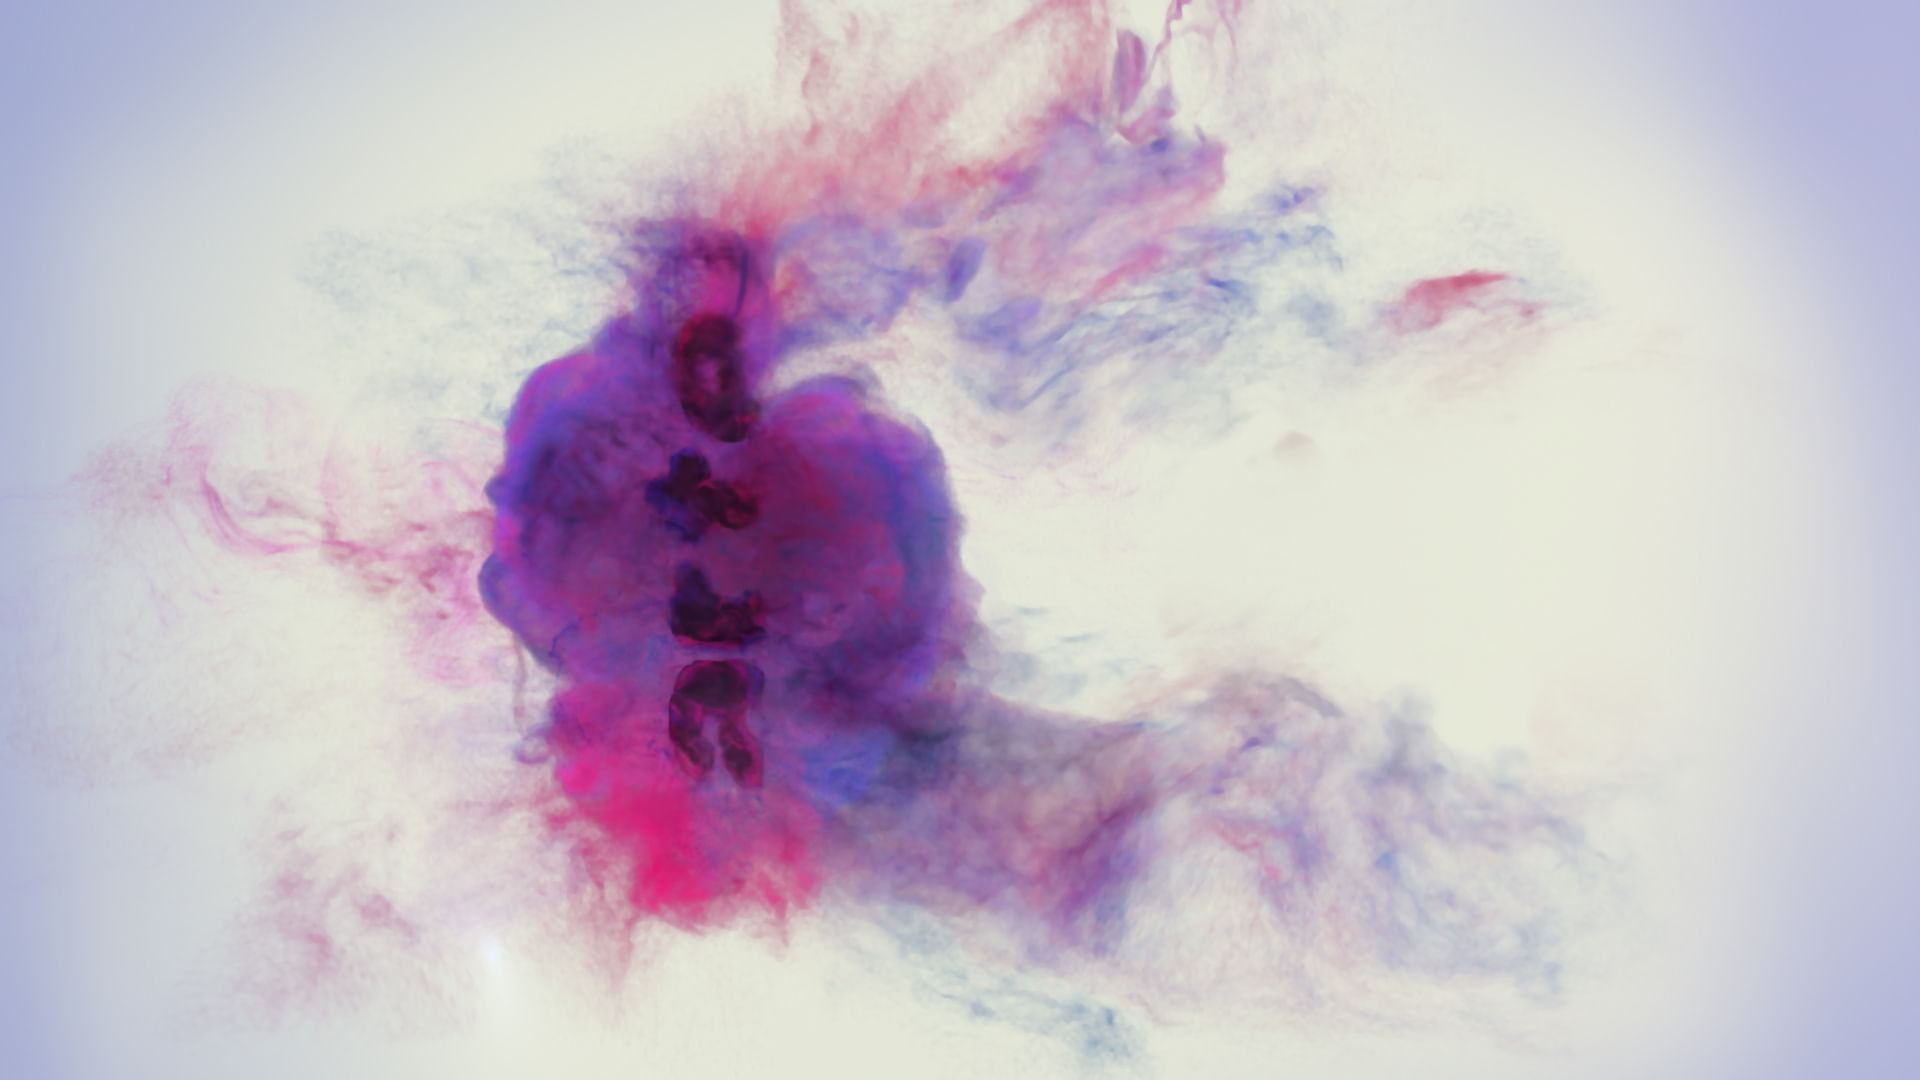 Blow up - Zombies im Film